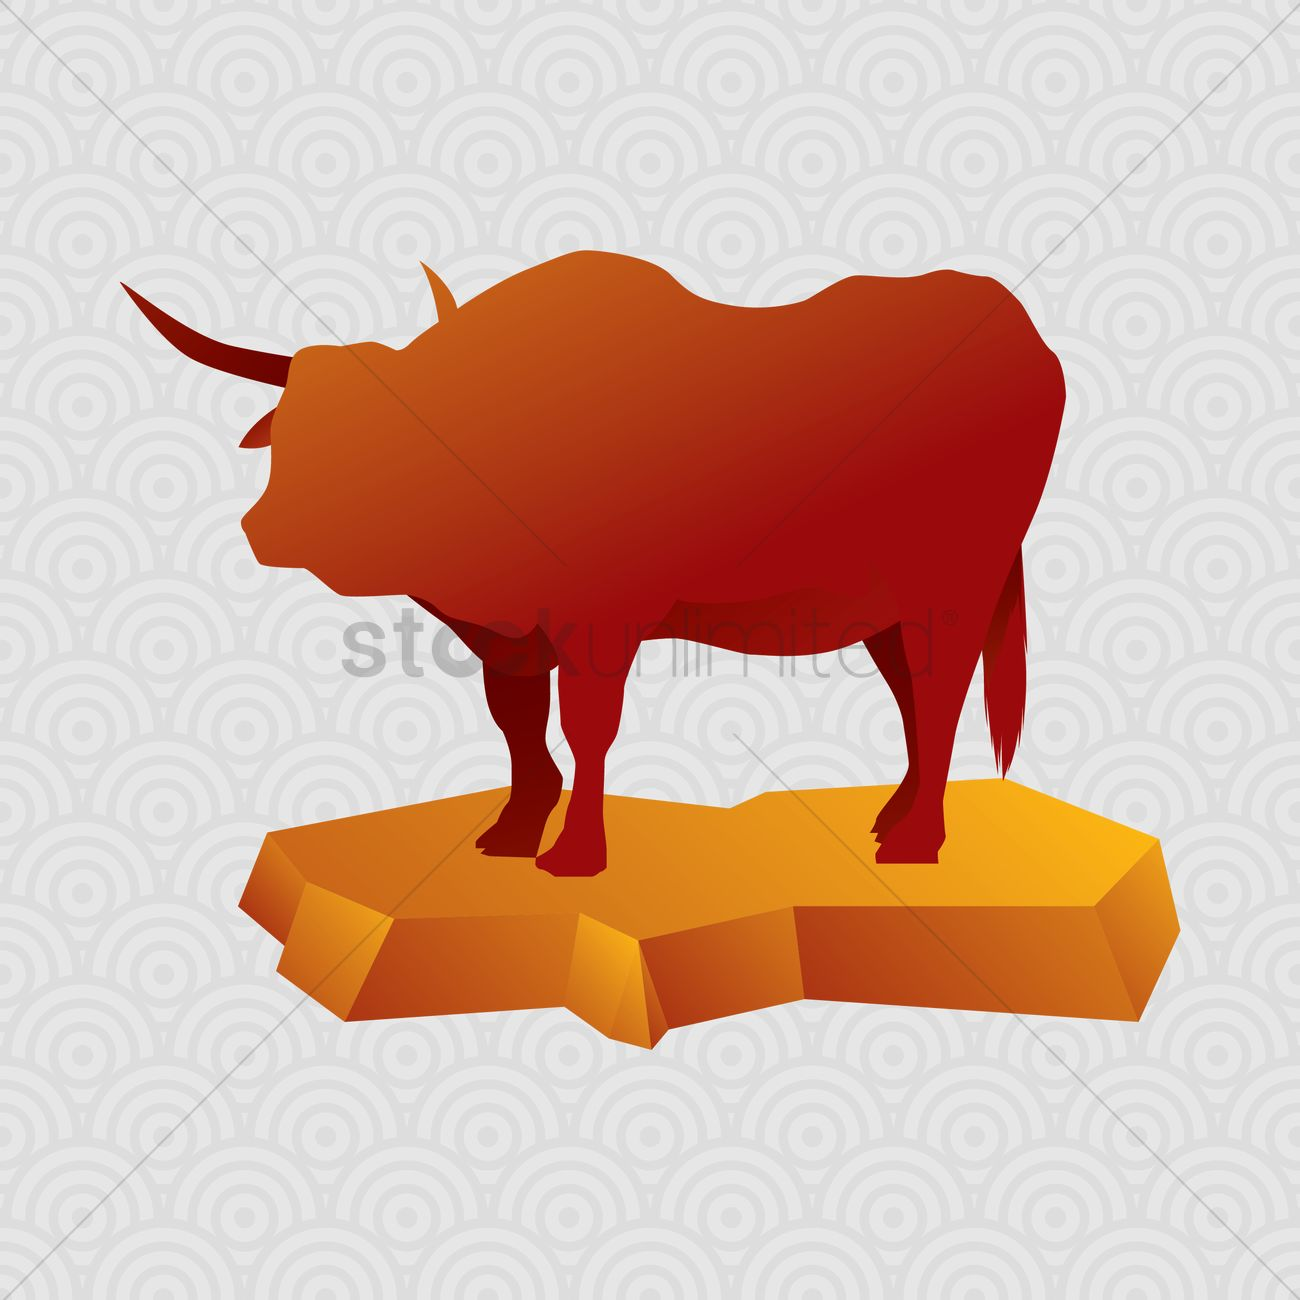 Chinese zodiac ox figurine Vector Image - 1373775